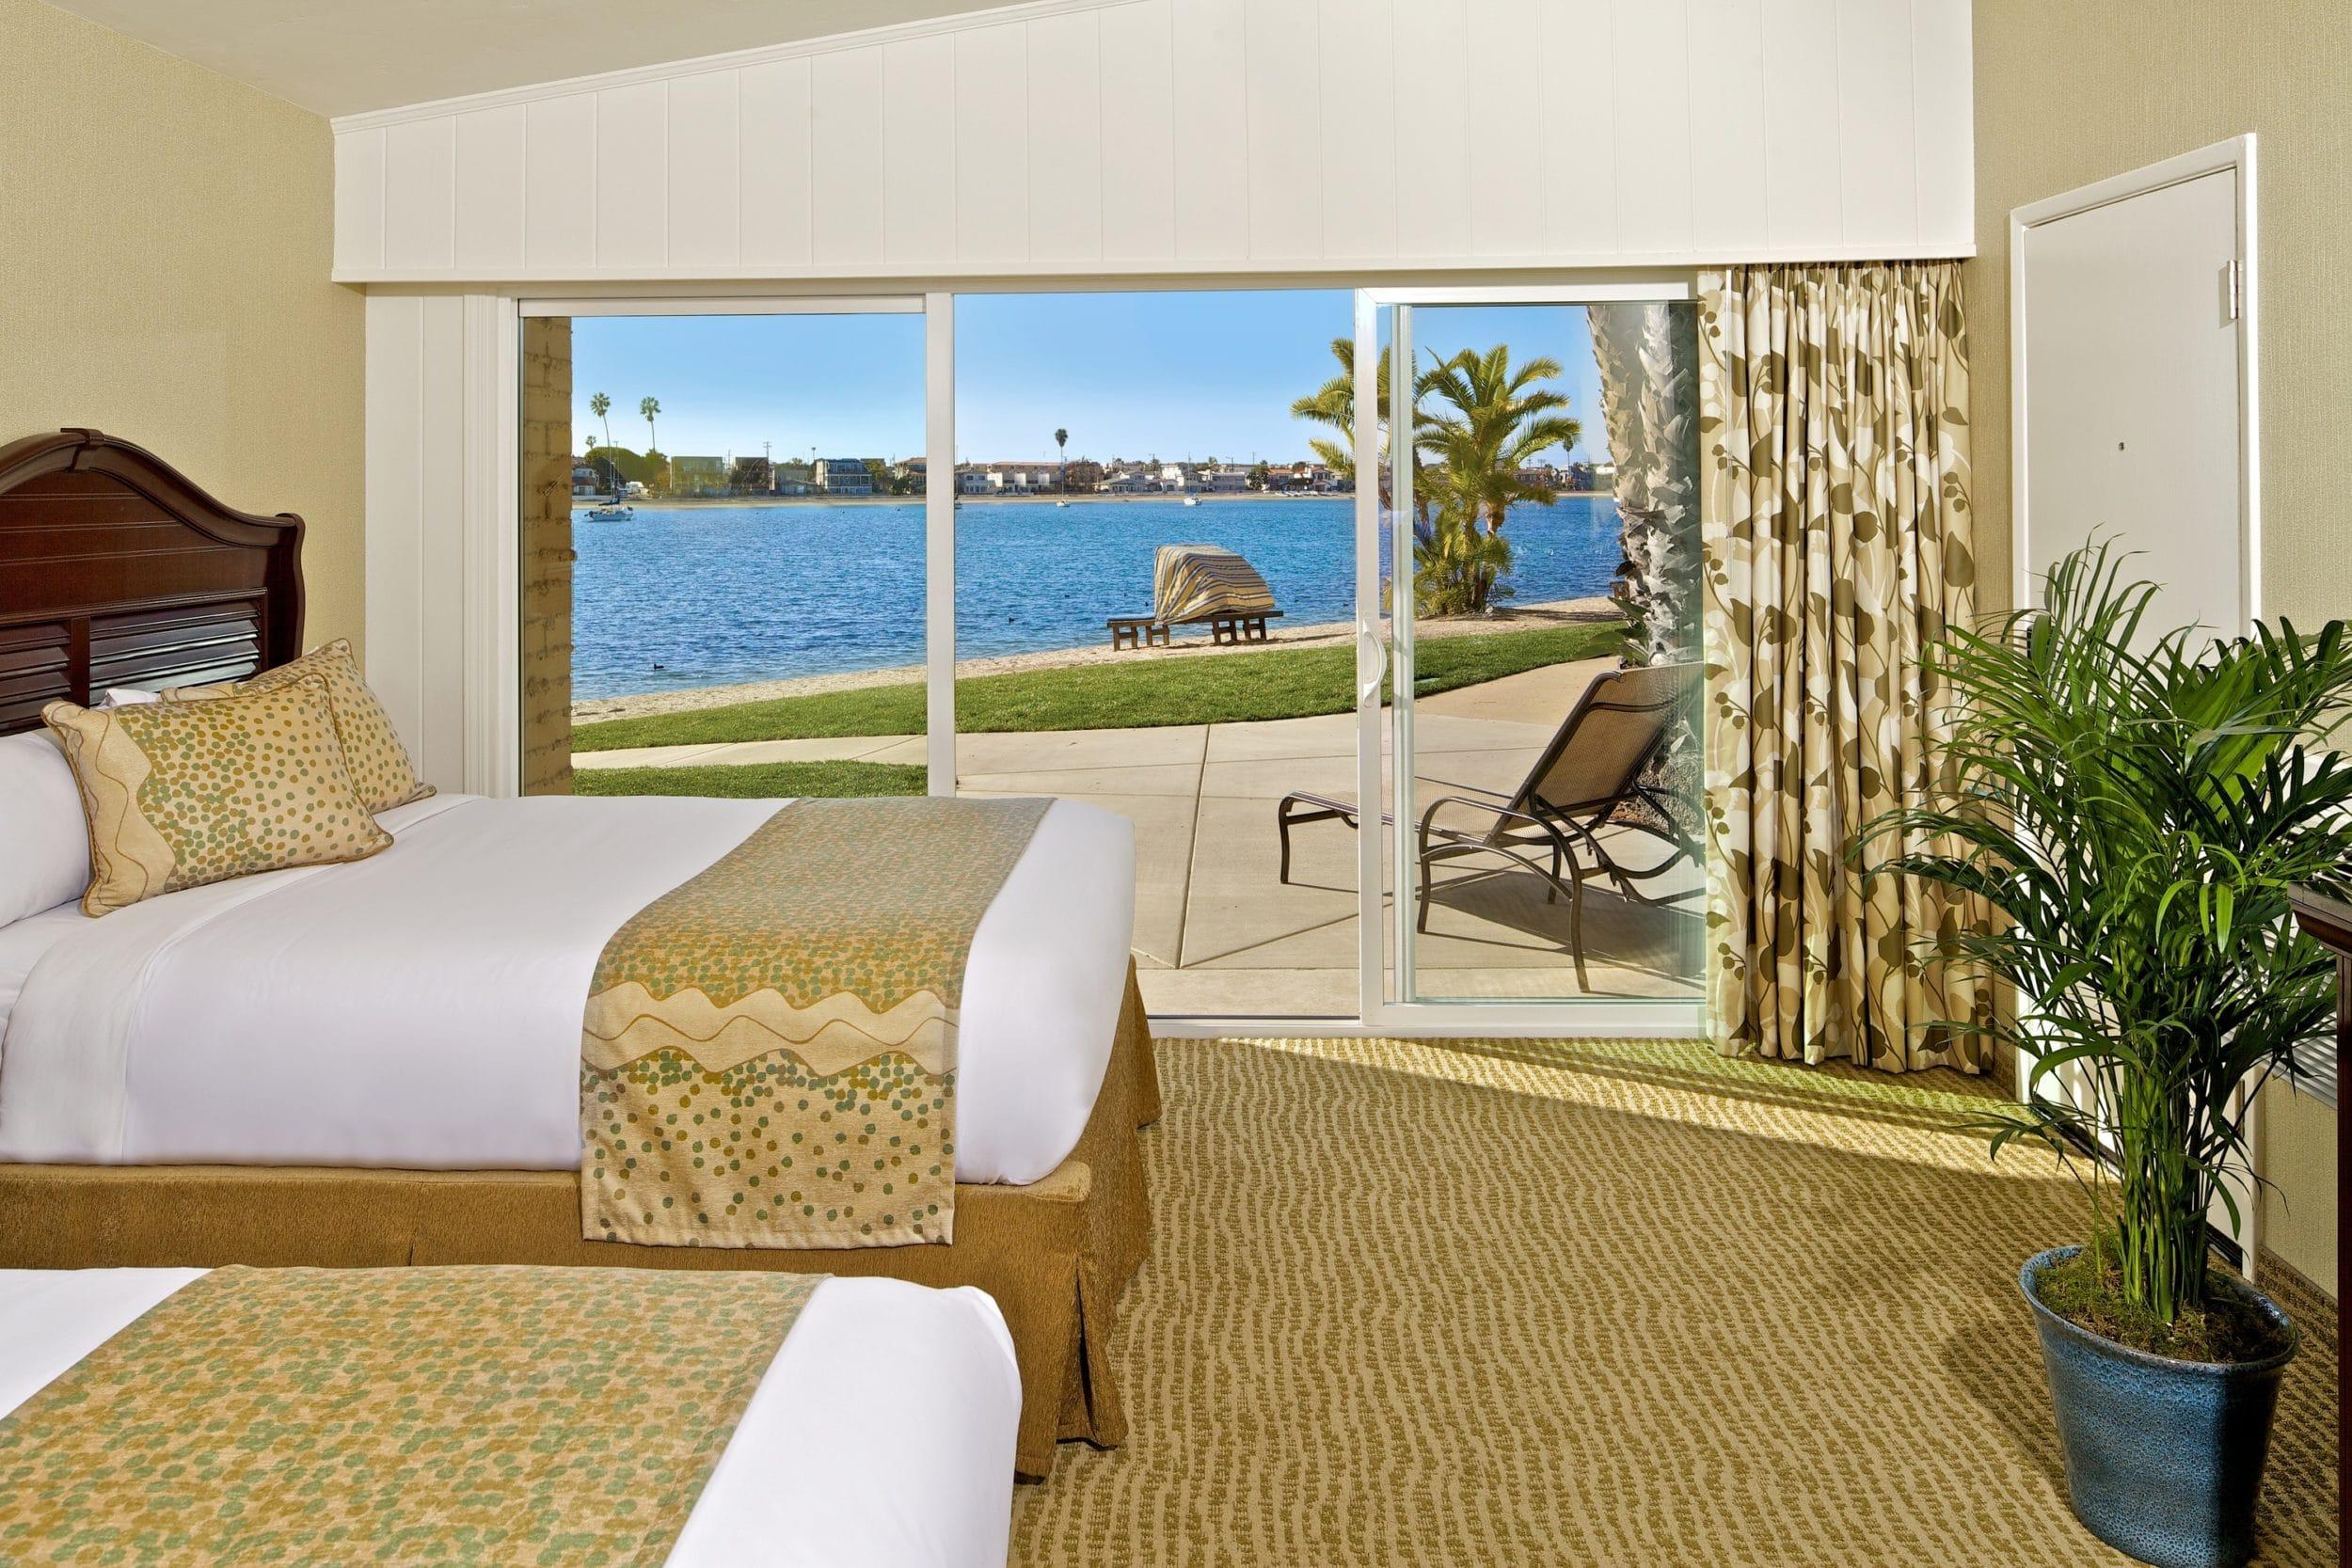 2 Bedroom Suites In San Diego Beach Bedroom Suites